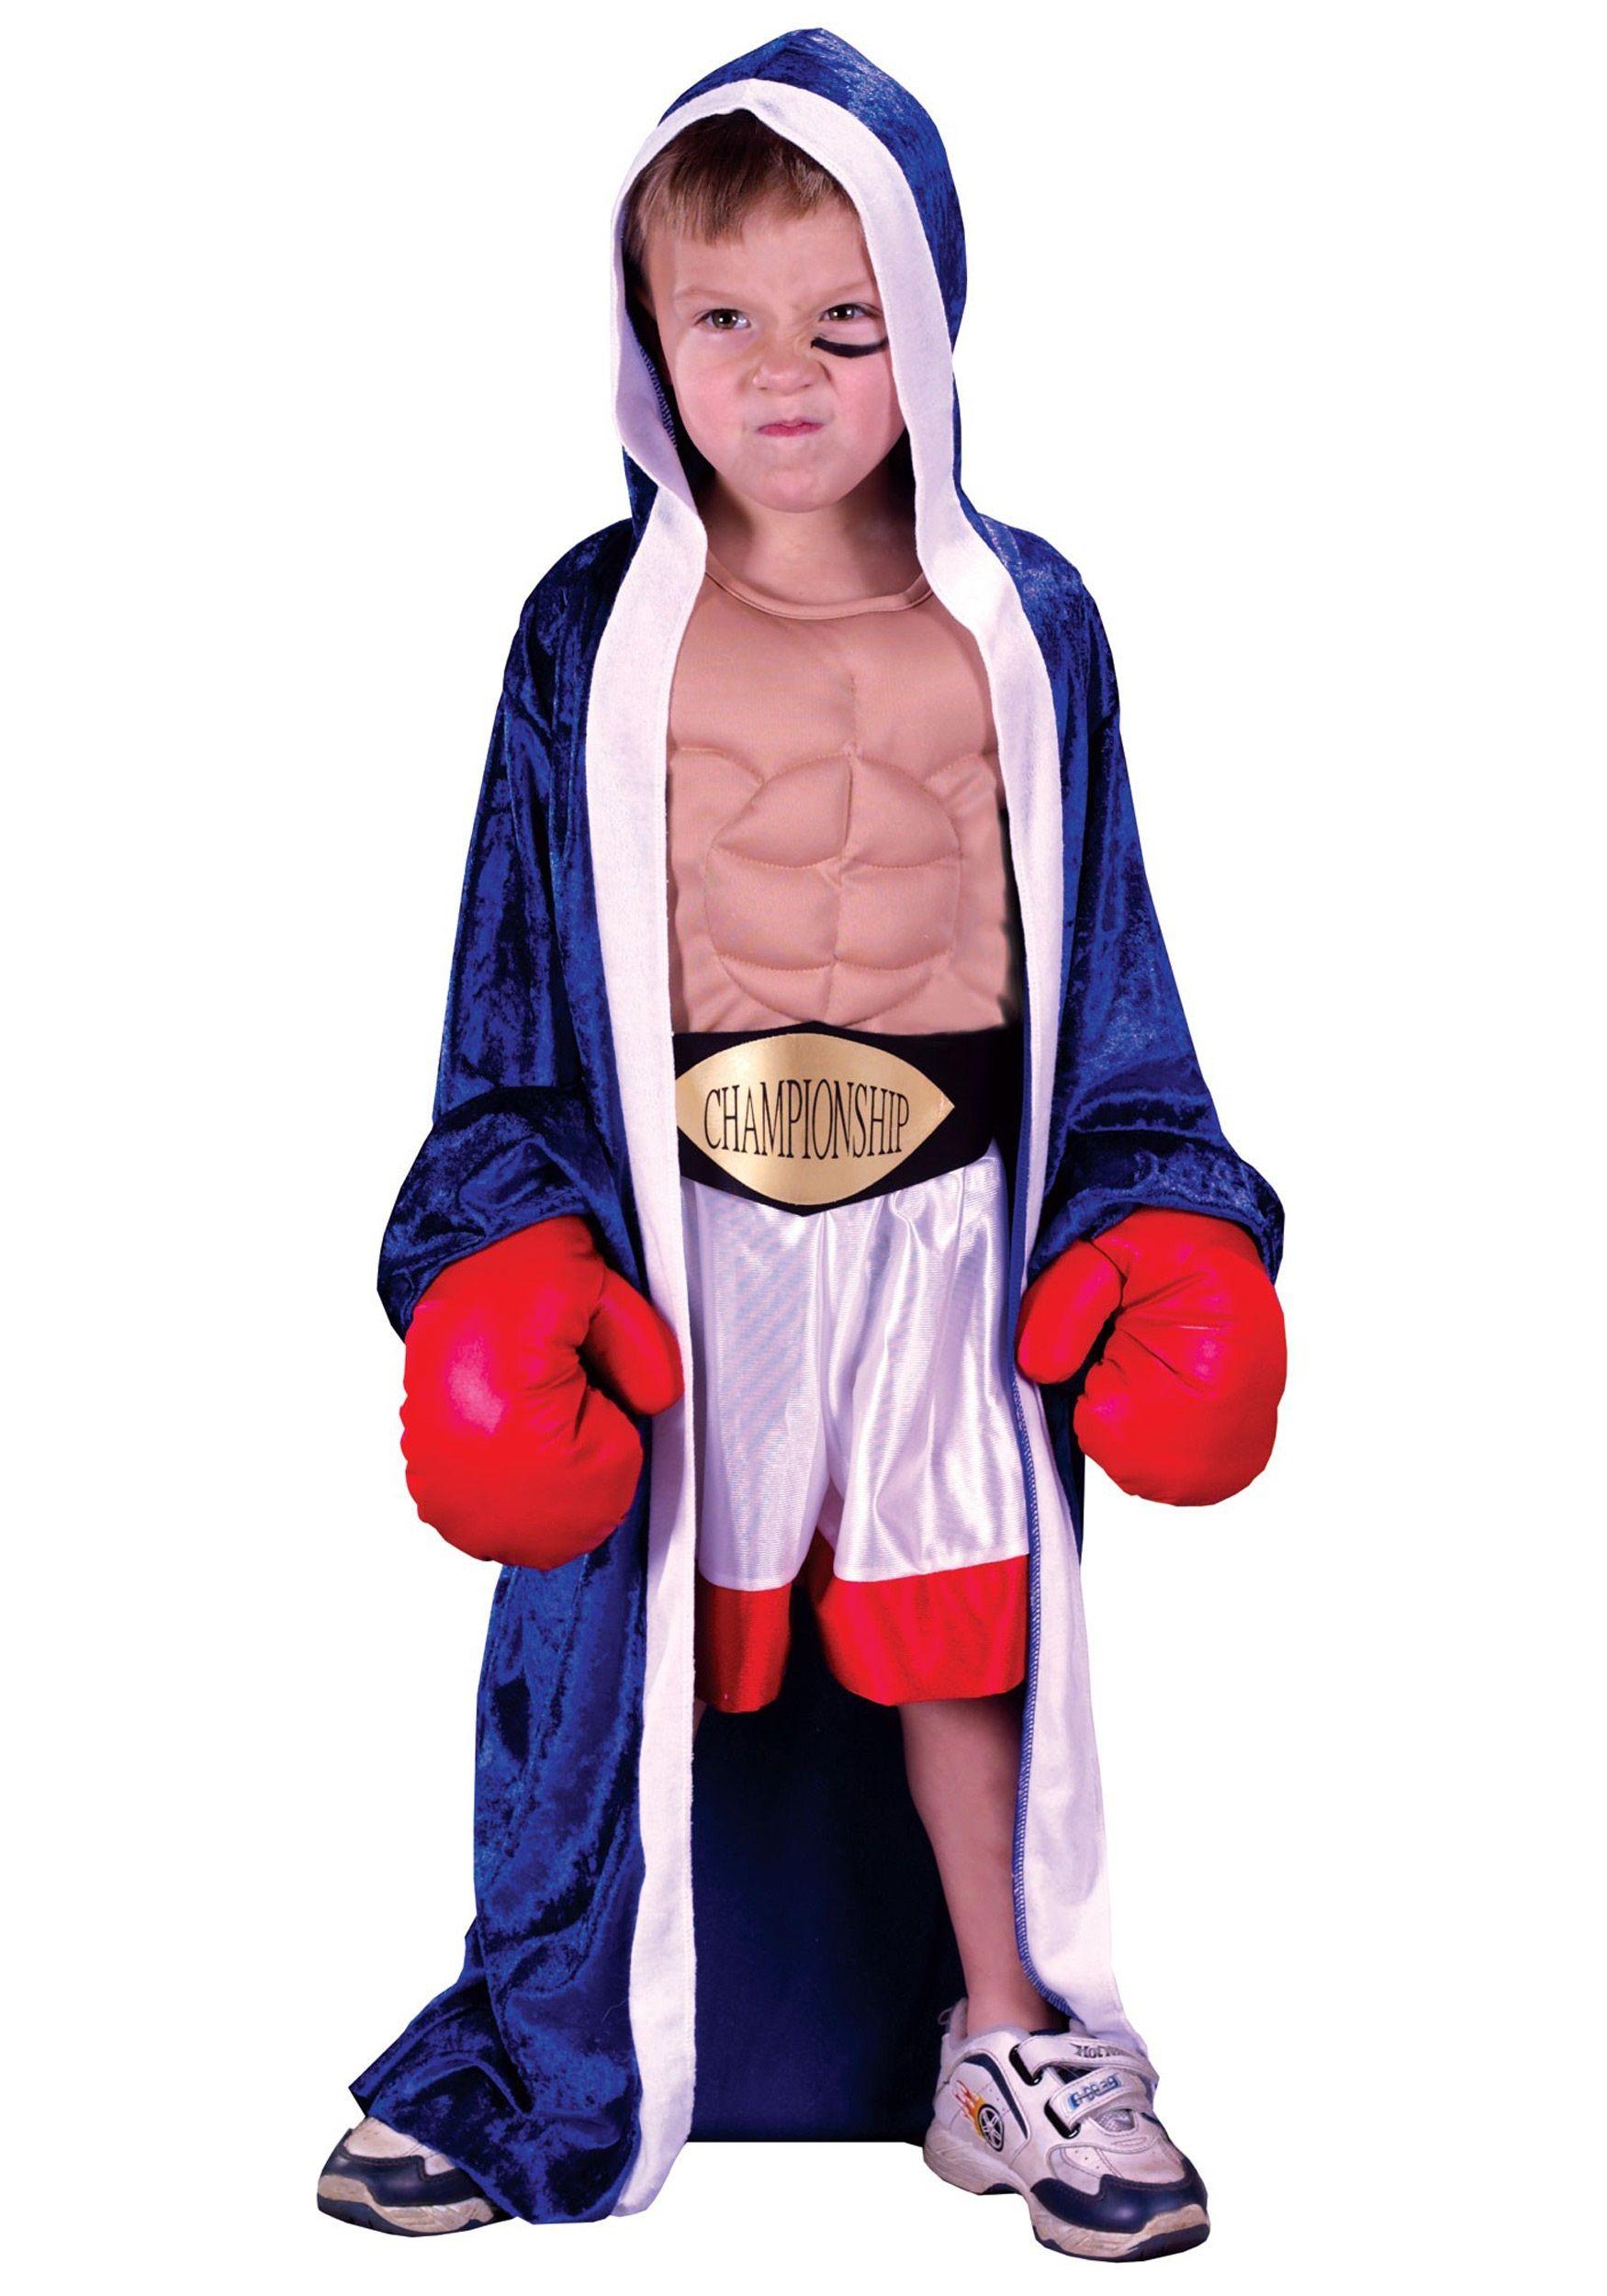 Toddler Boxer Costume | Baby Halloween Costumes | Pinterest ...